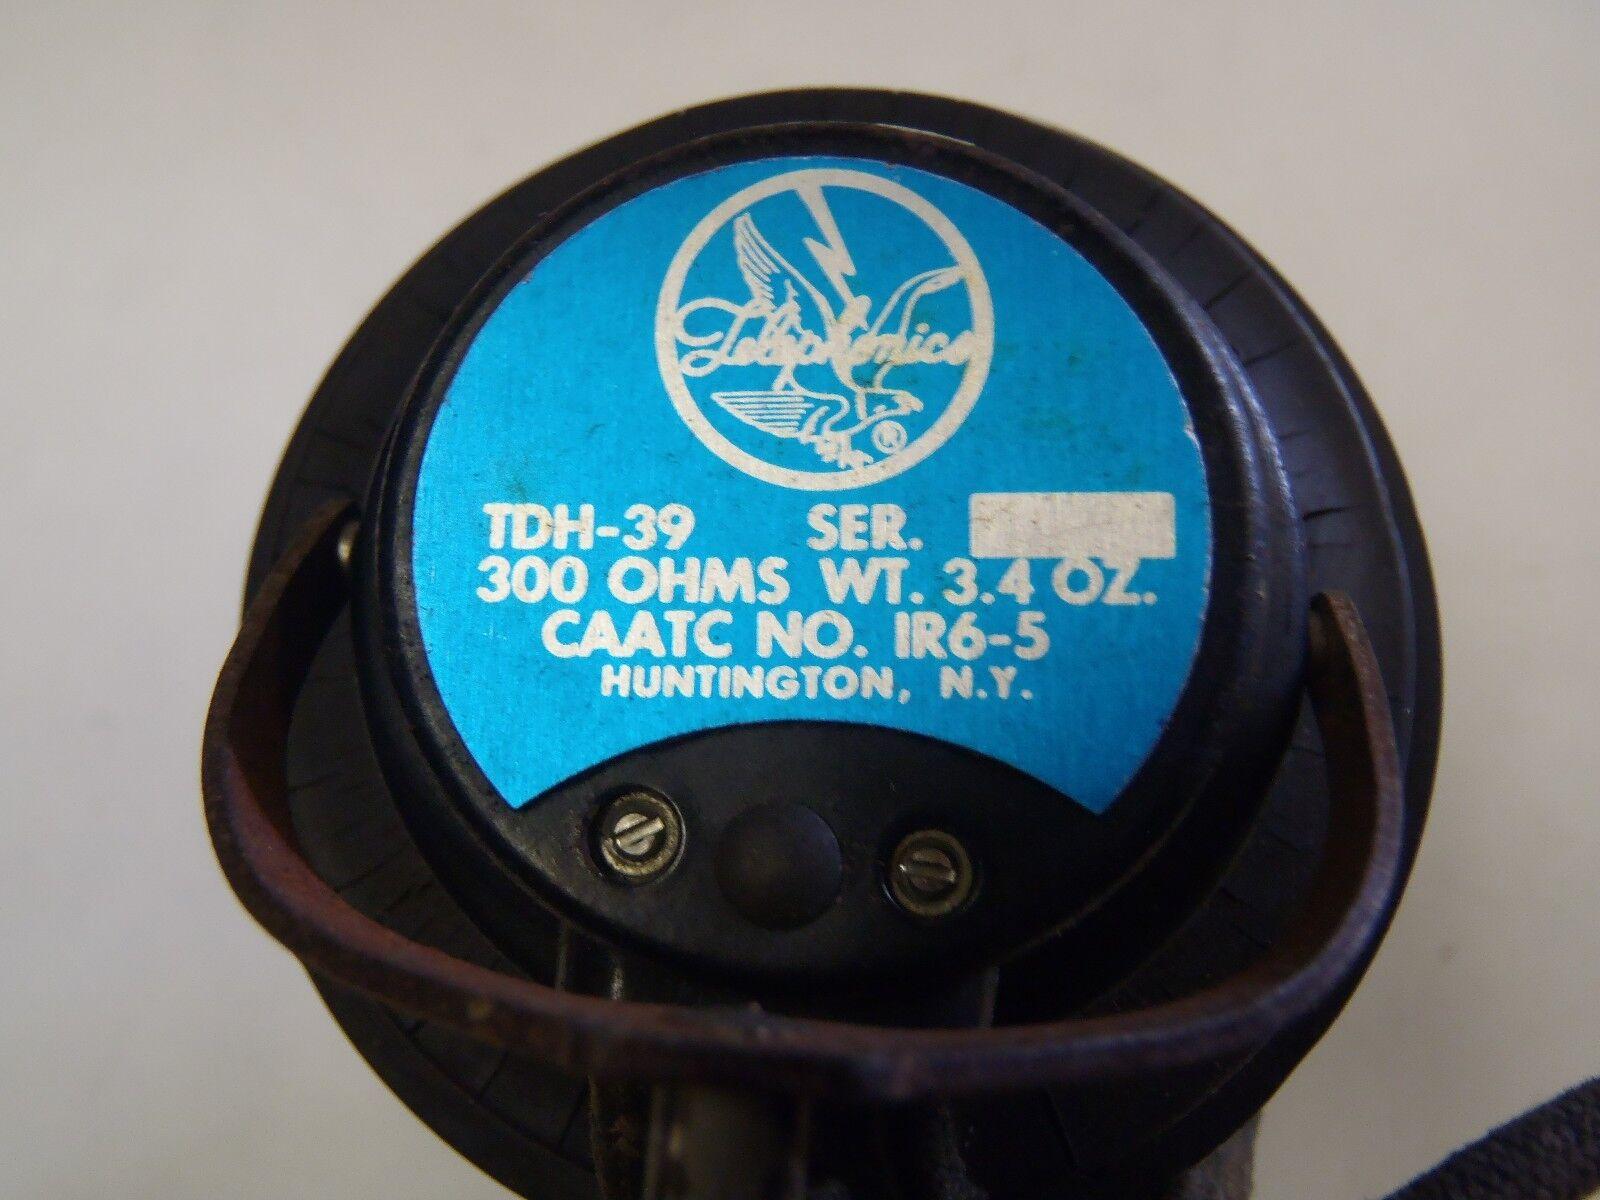 VINTAGE TELEPHONICS TDH-39 AIRCREW HEADSET 300 OHMS CAATC NO IR6-5 RARE NO S/N